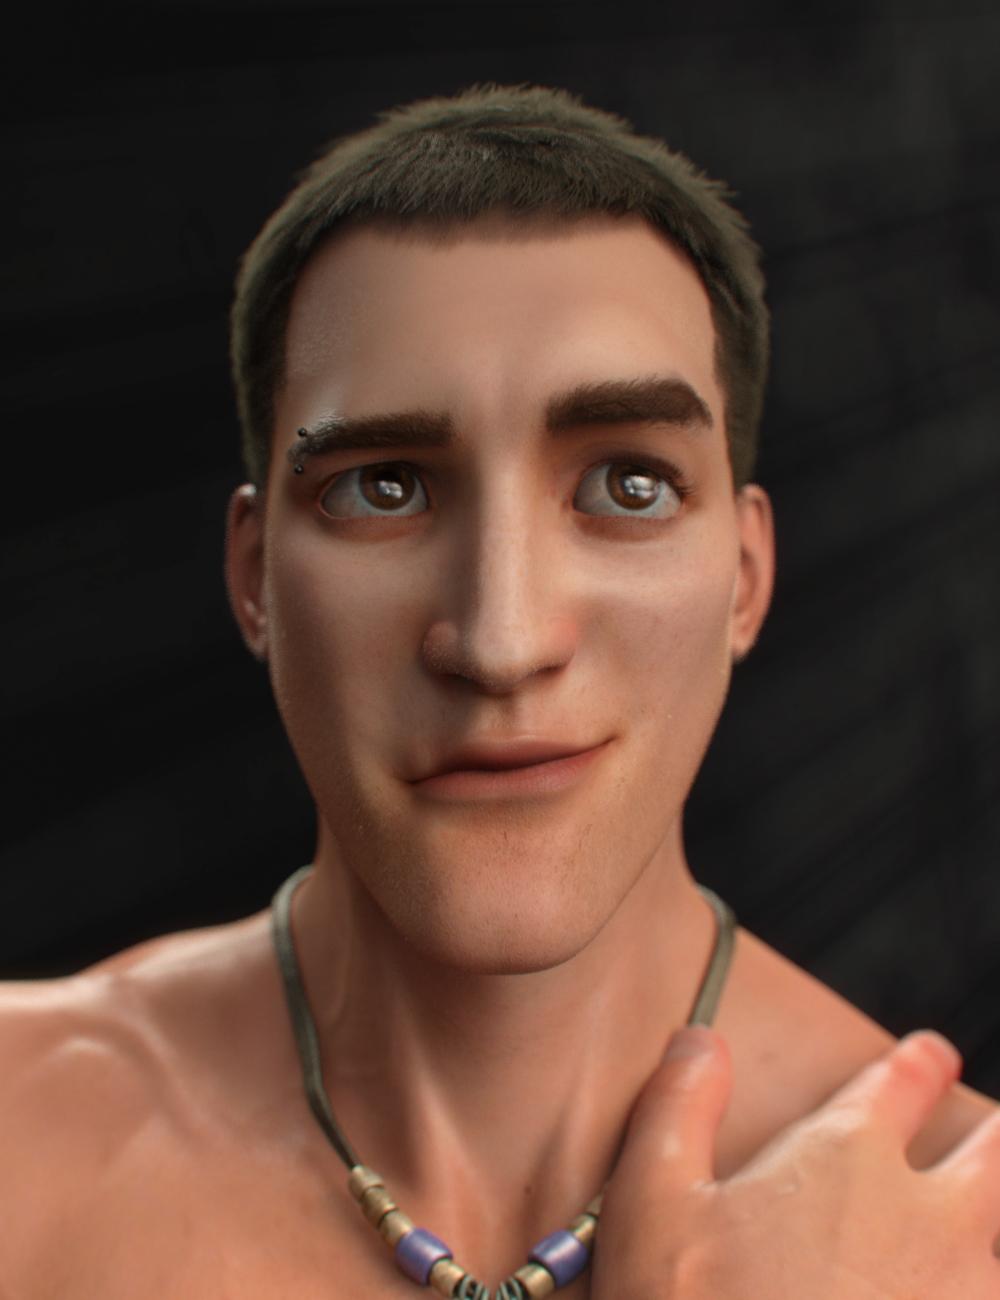 Brandon for Toon Dwayne 8 by: VincentXyooj, 3D Models by Daz 3D